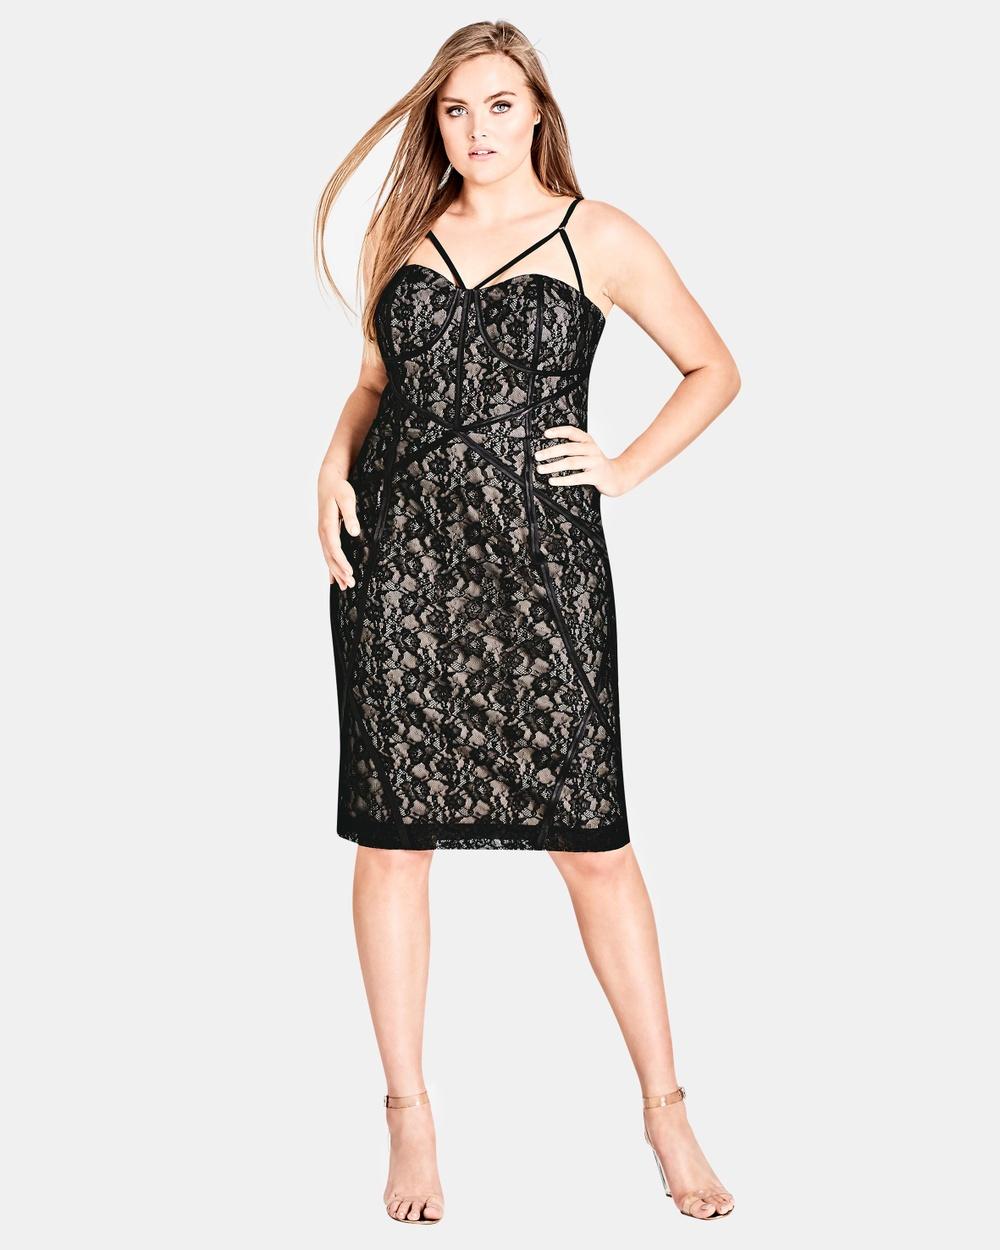 City Chic Winner Circle Dress Bodycon Dresses Black Winner Circle Dress